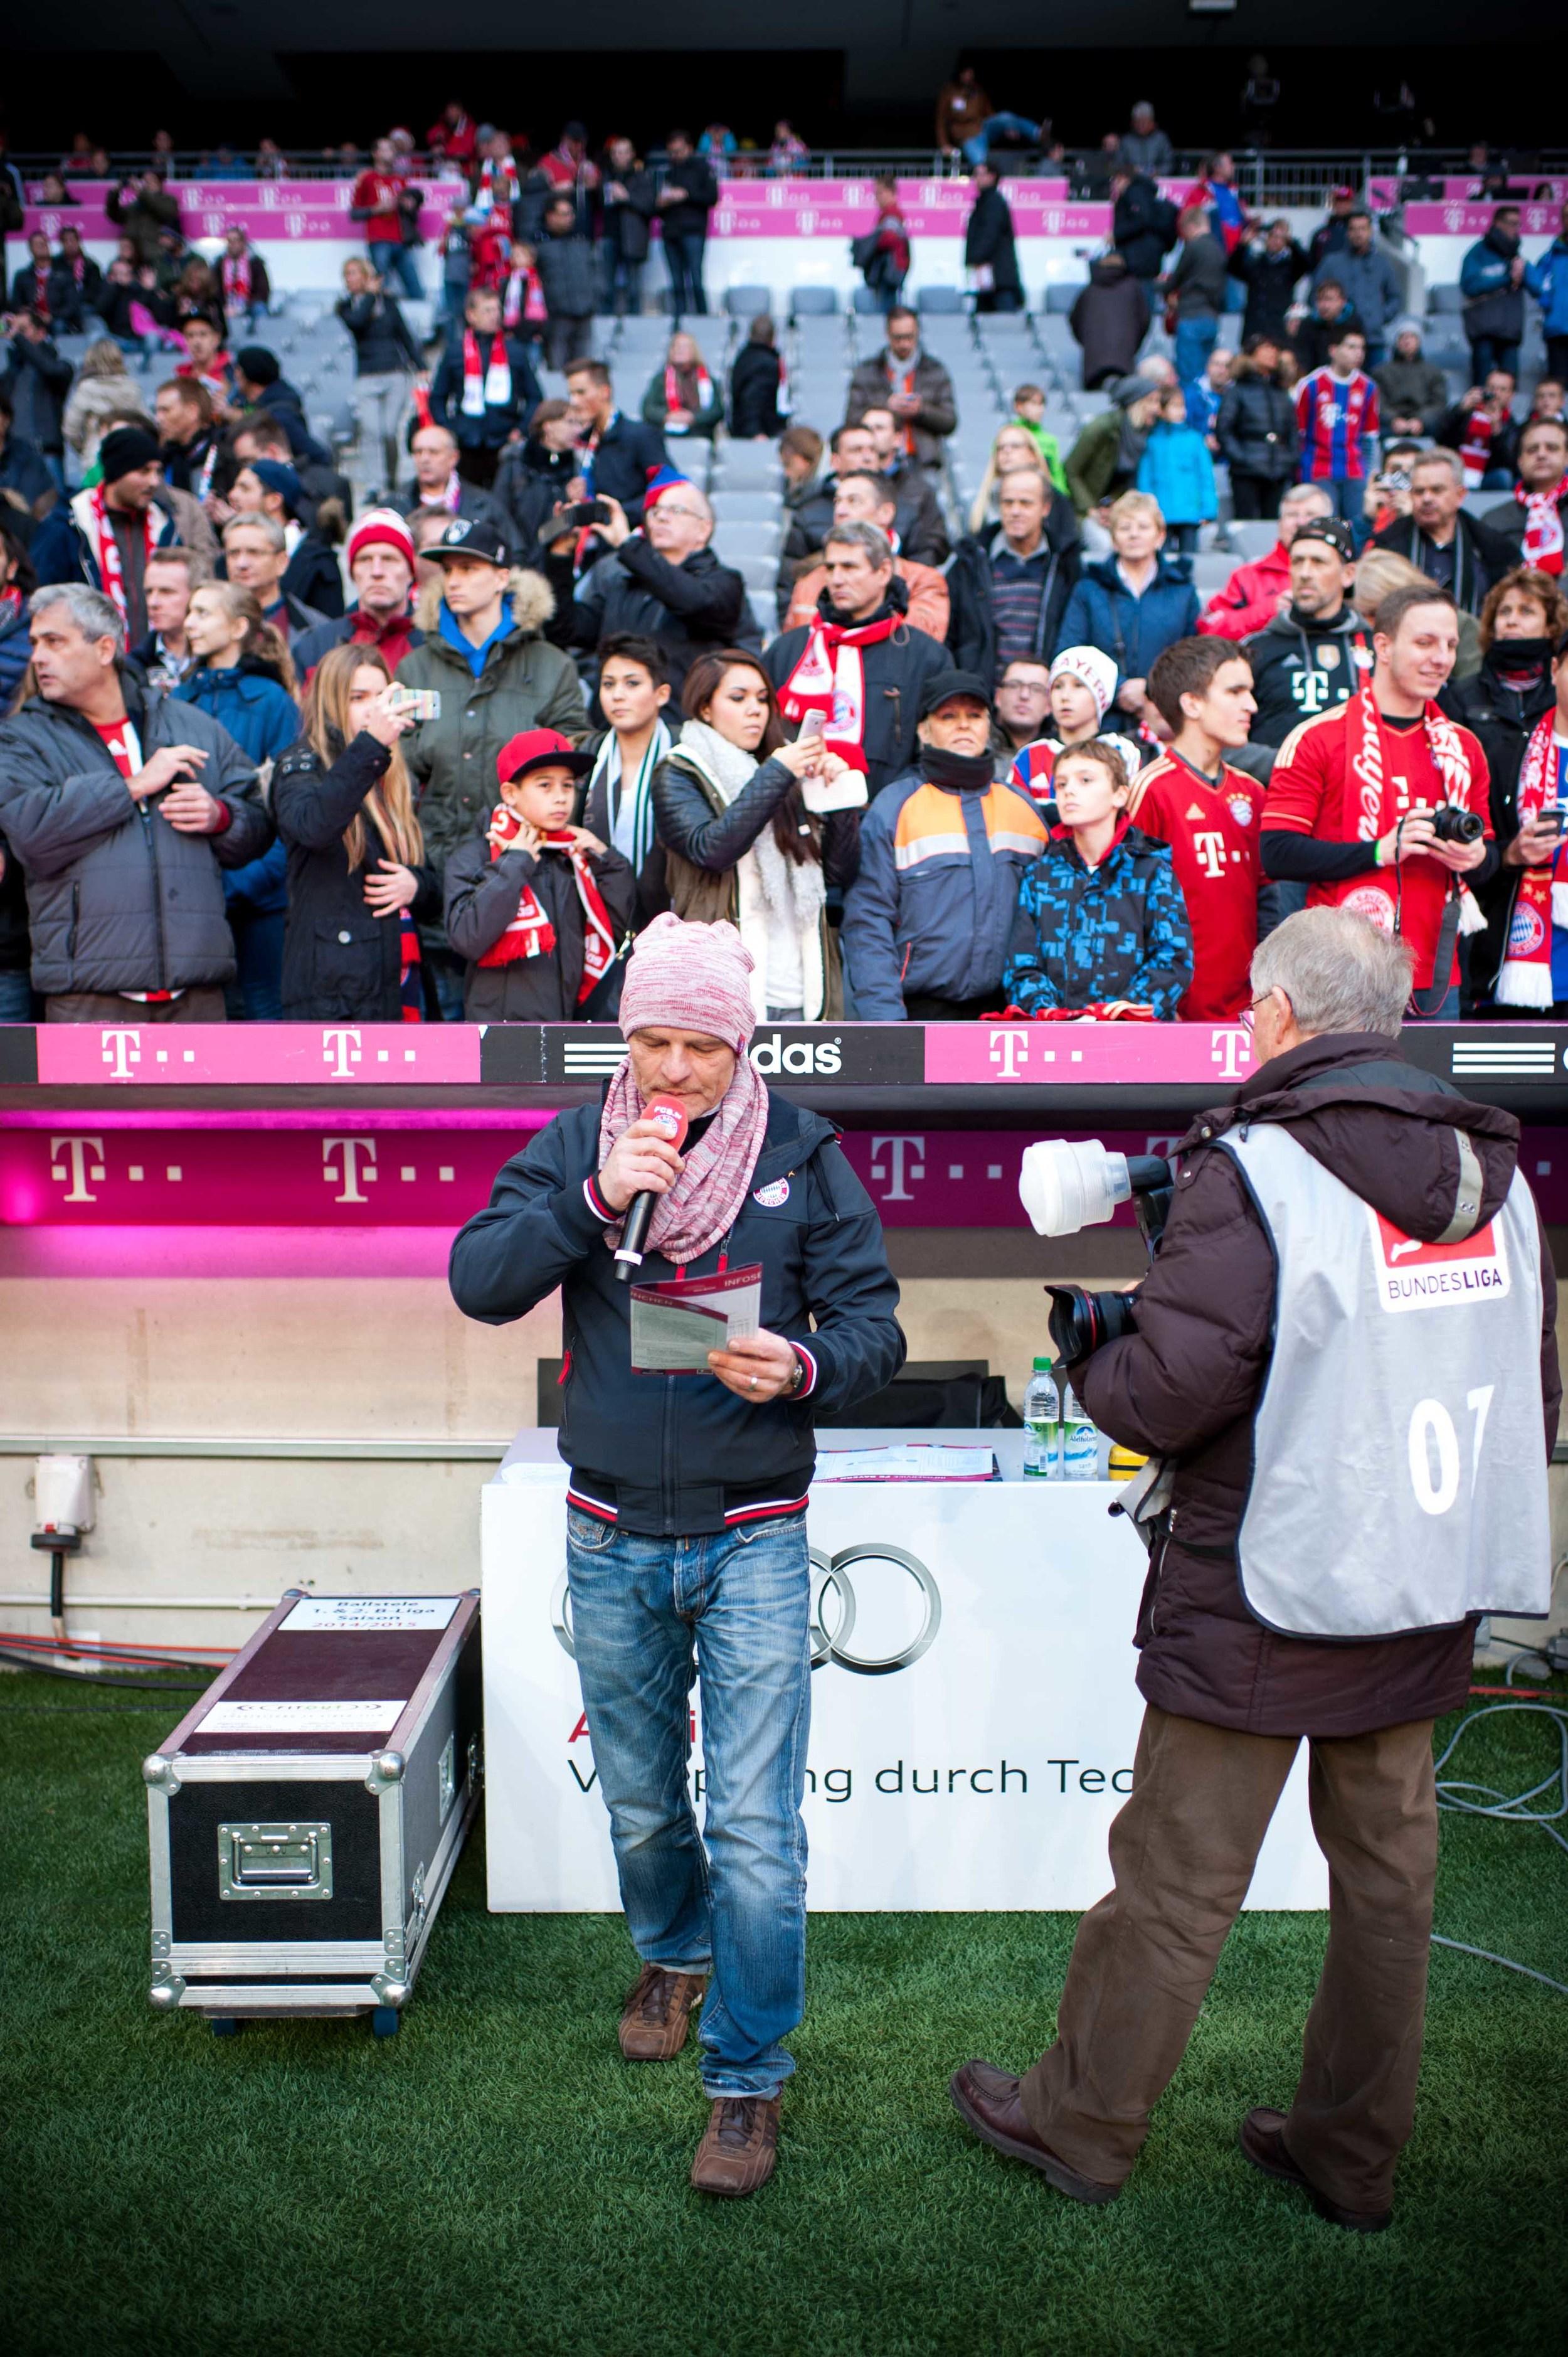 Stadion_FCB_vs_TSGH_22.11.2014_web-4.jpg